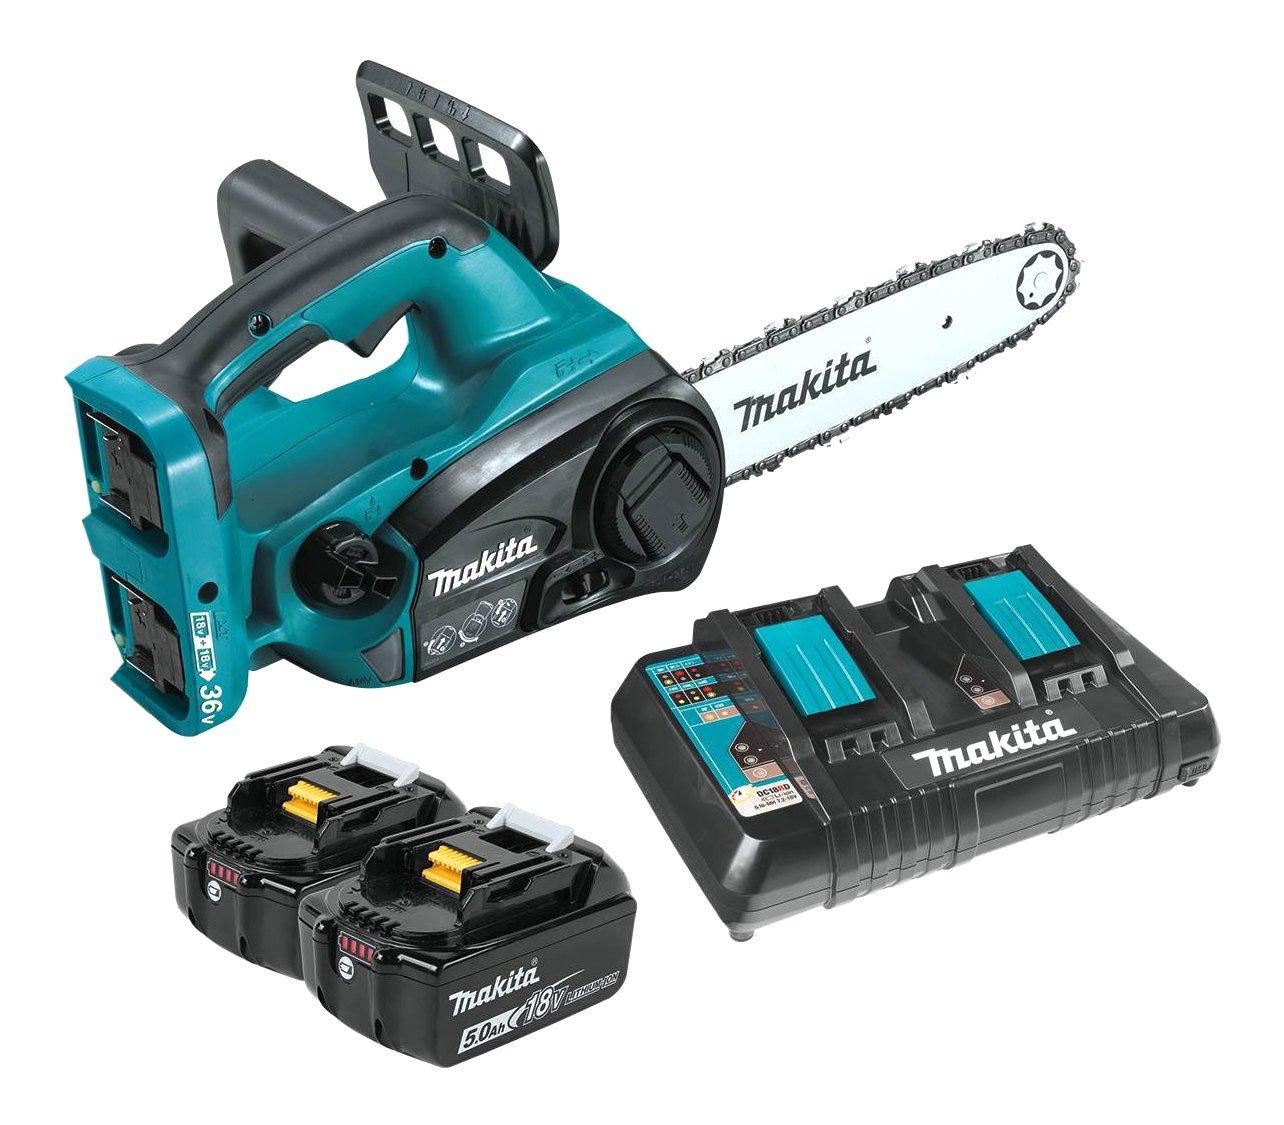 10. Makita XCU02PT 18Volt X2 LXT Battery Powered Chainsaw